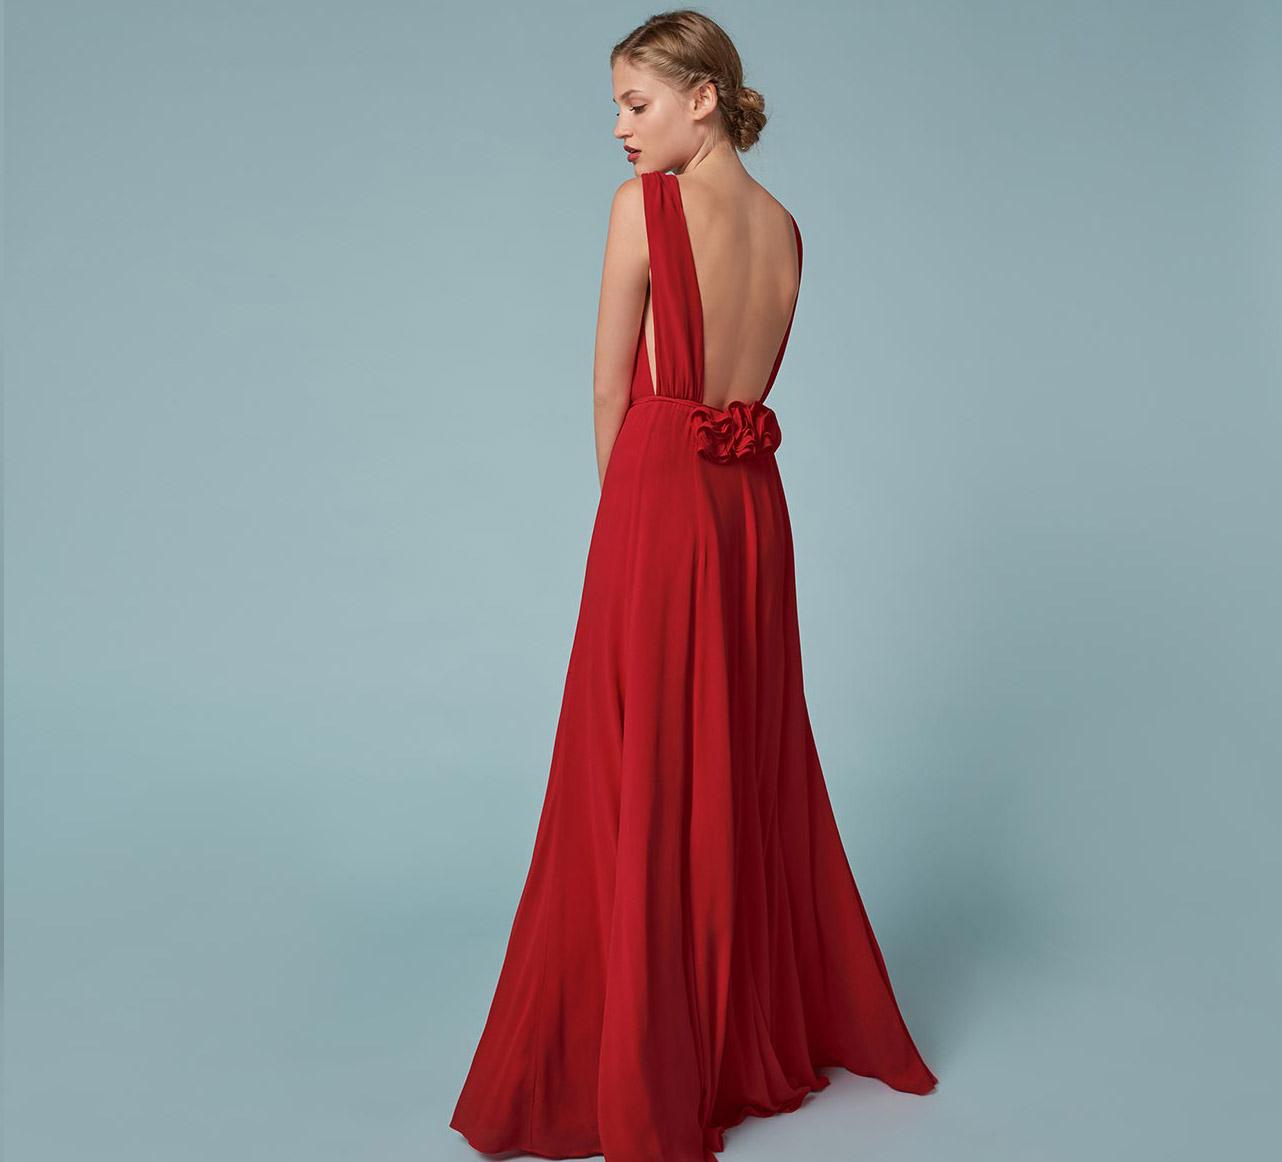 Reformation 'Anne' dress in Poinsettia,  $428